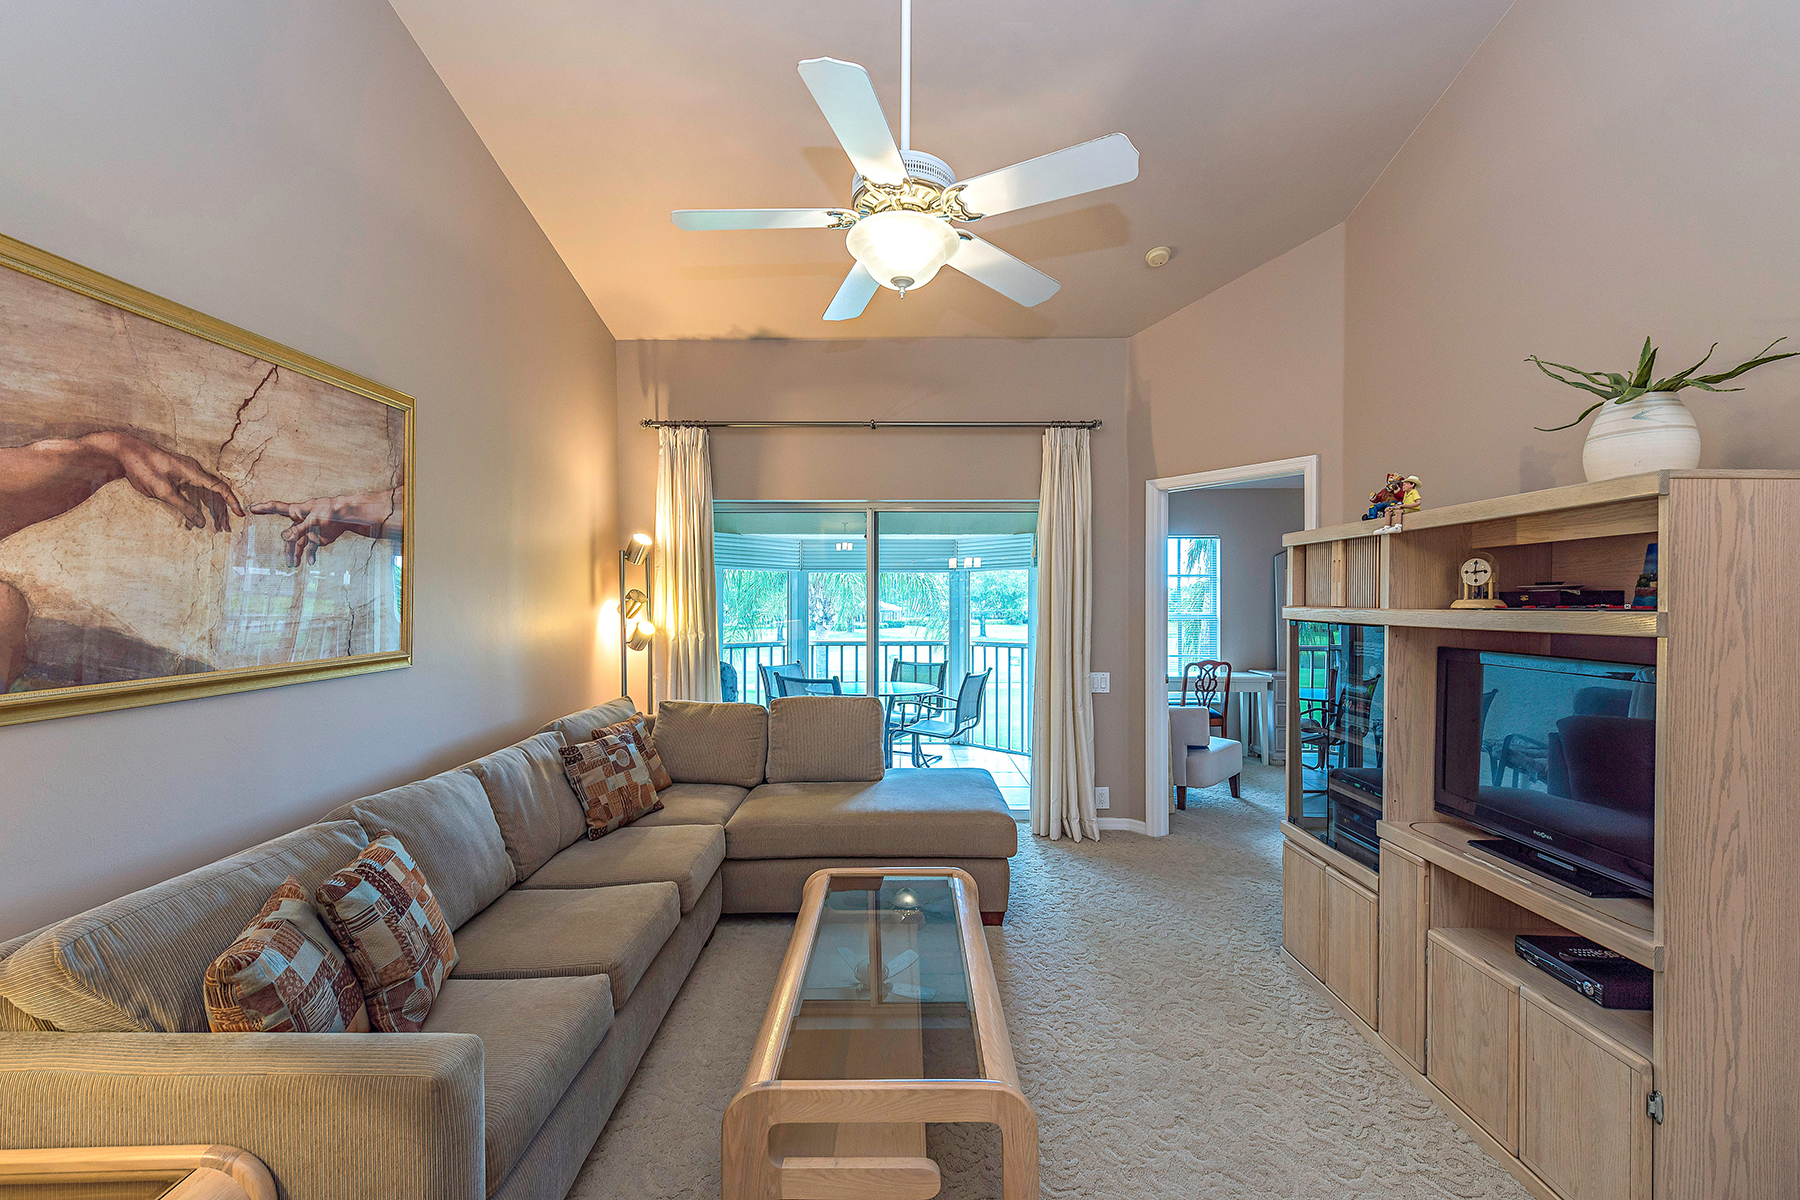 Condomínio para Venda às WORTHINGTON 13611 Worthington Way 1310 Bonita Springs, Florida, 34135 Estados Unidos